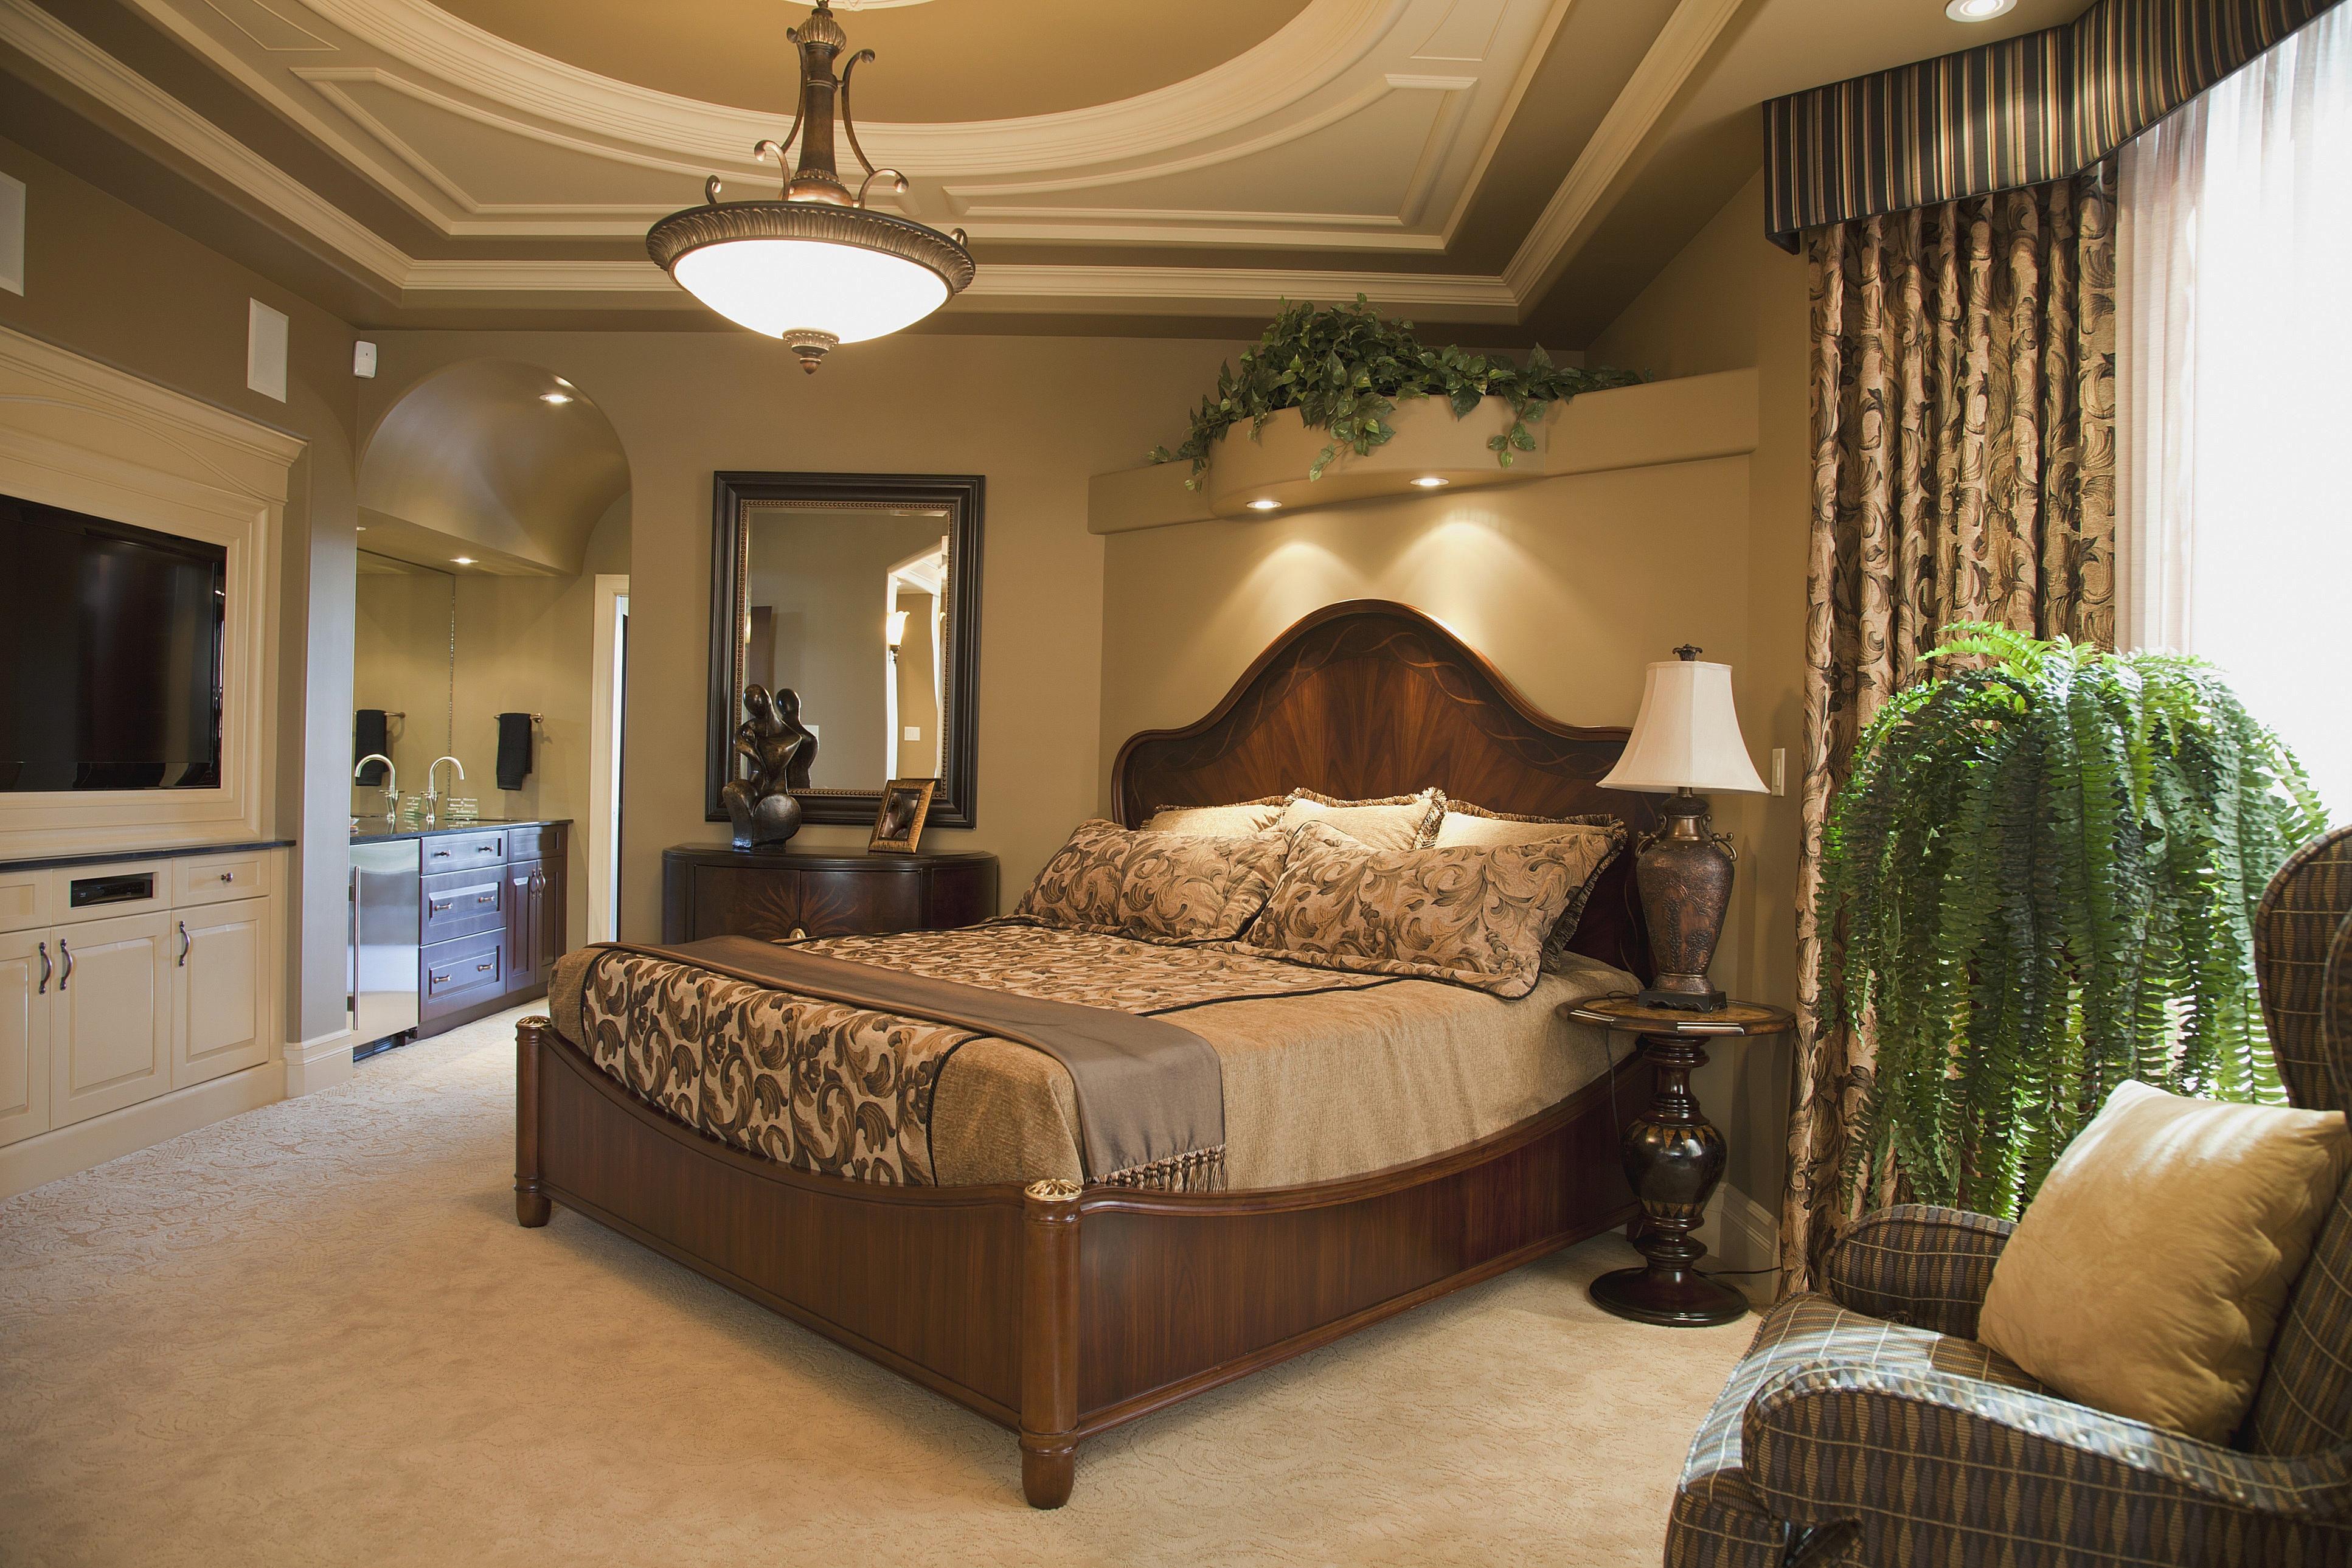 Tuscan Bedroom Decorating Ideas and Photos on Room Decor Photos  id=13560